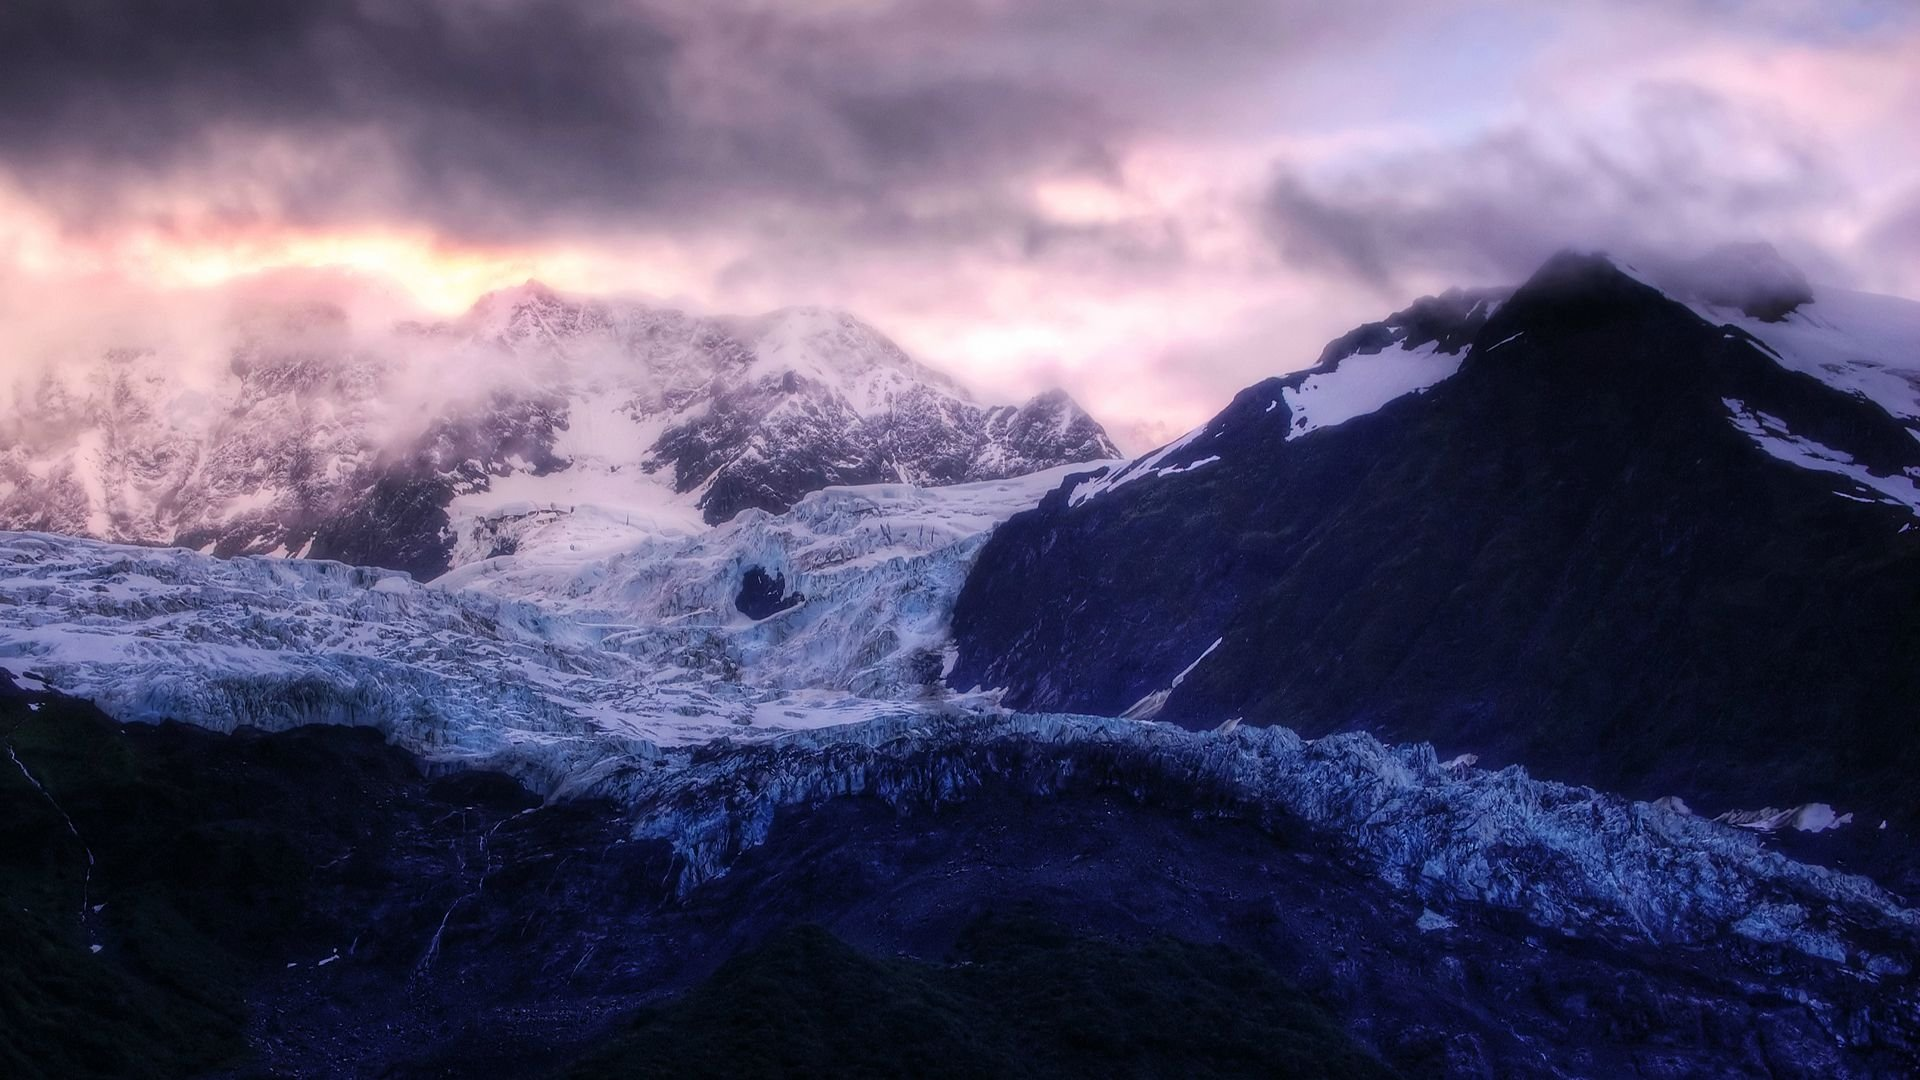 cloudy mountain phone wallpaper - photo #35